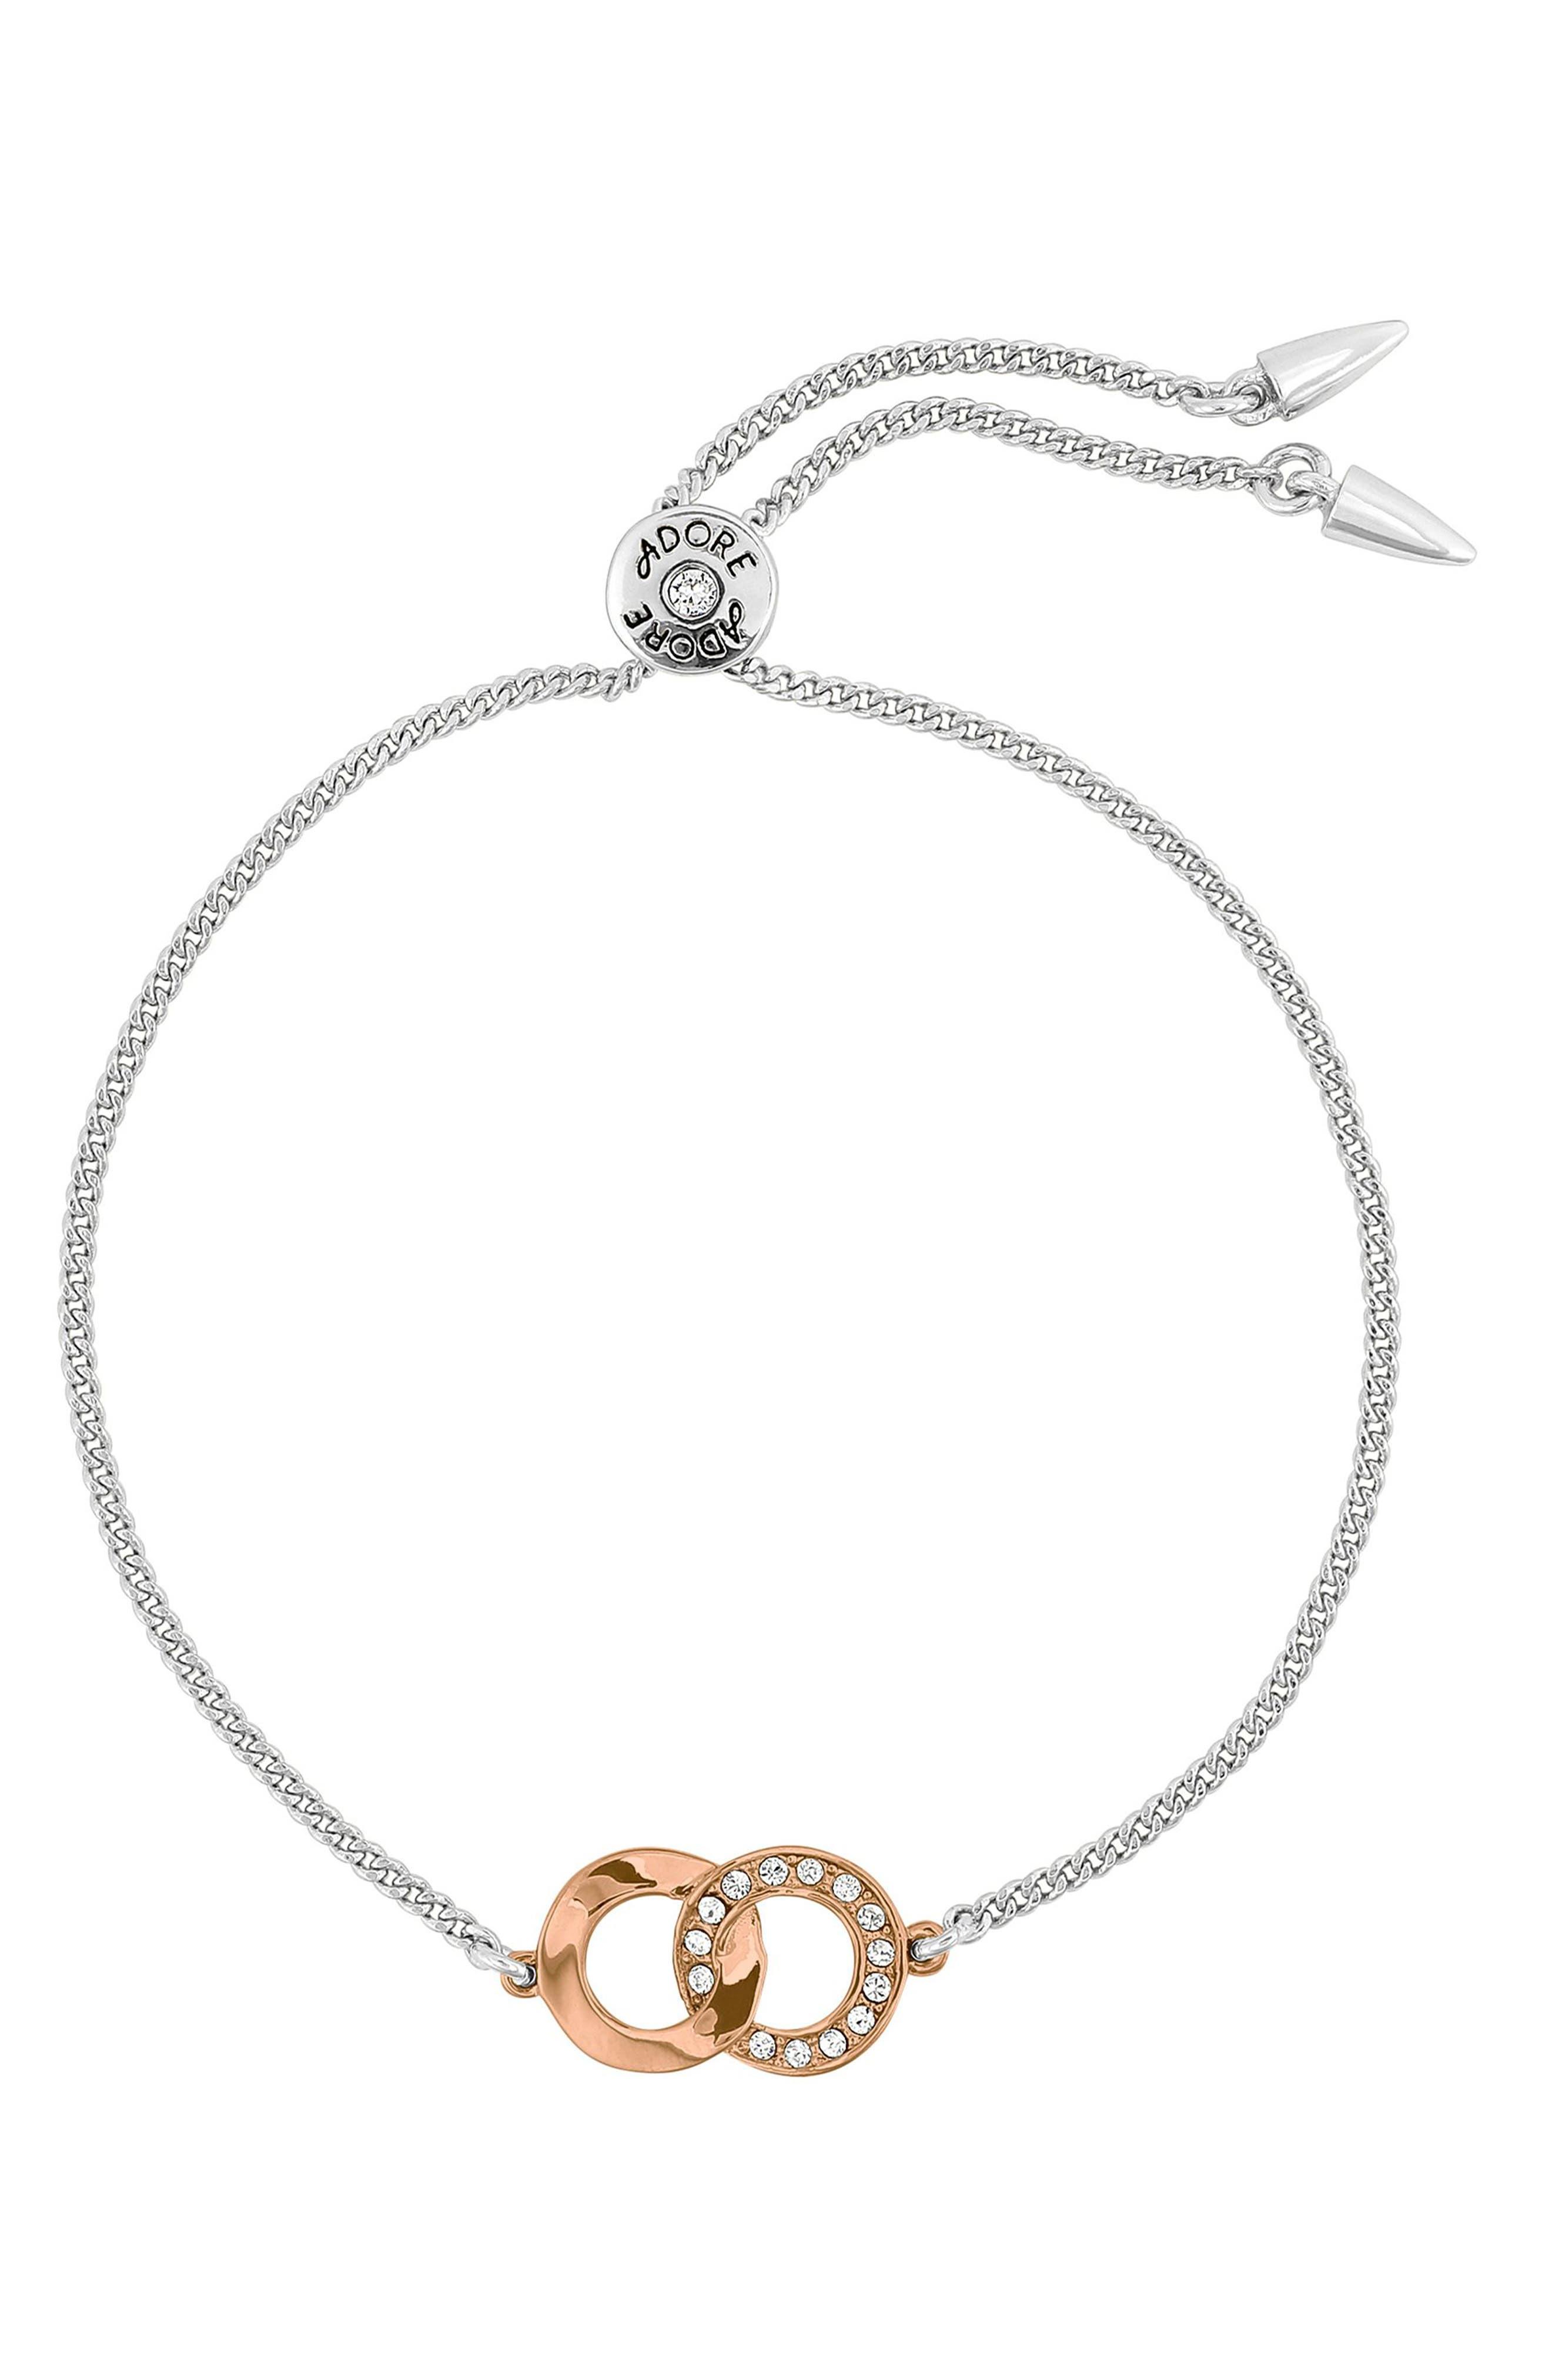 ADORE Interlocking Ring Adjustable Bracelet in Silver/ Rose Gold